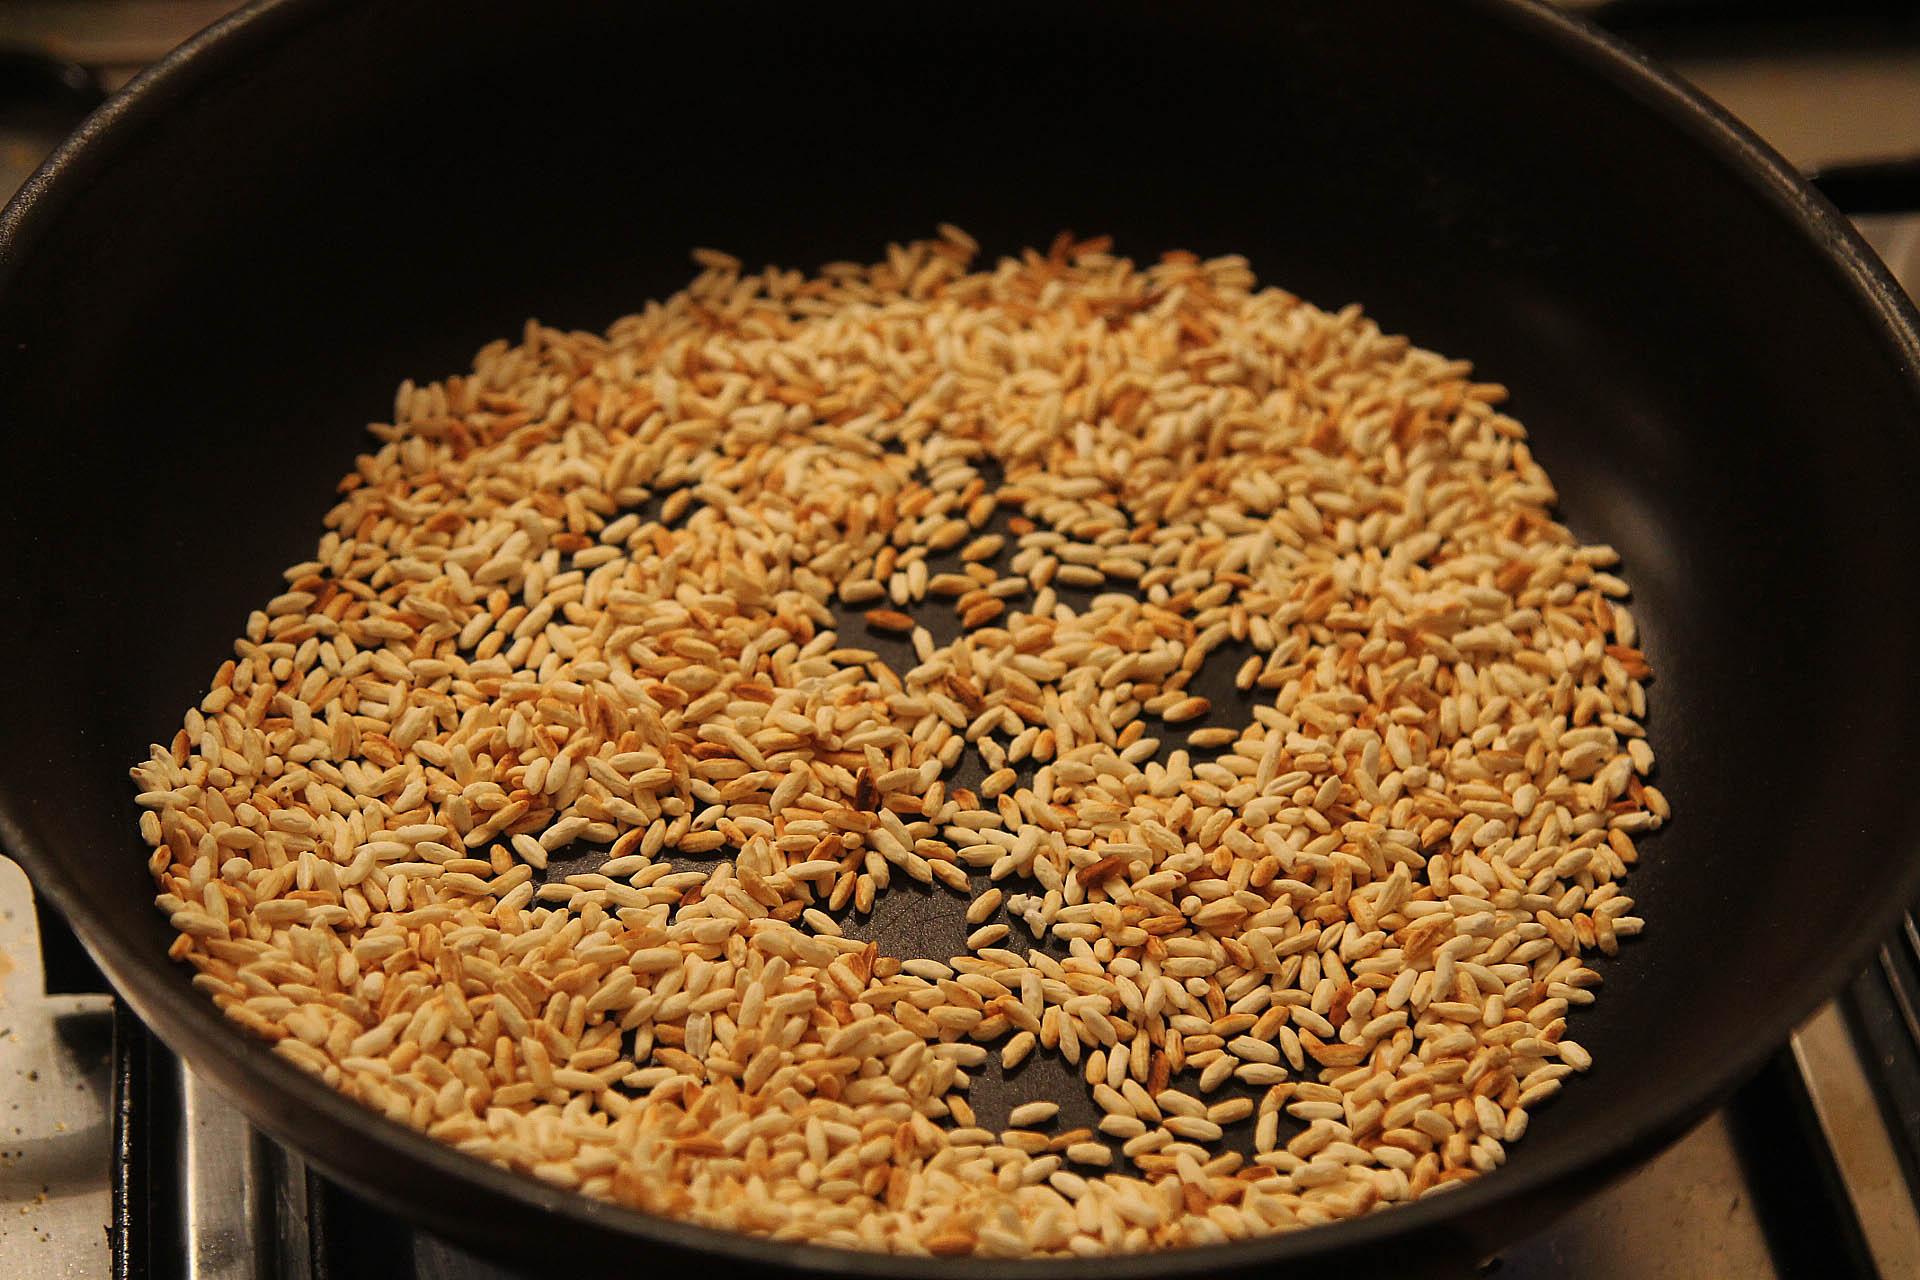 Making Khao Khoa - roasted rice powder